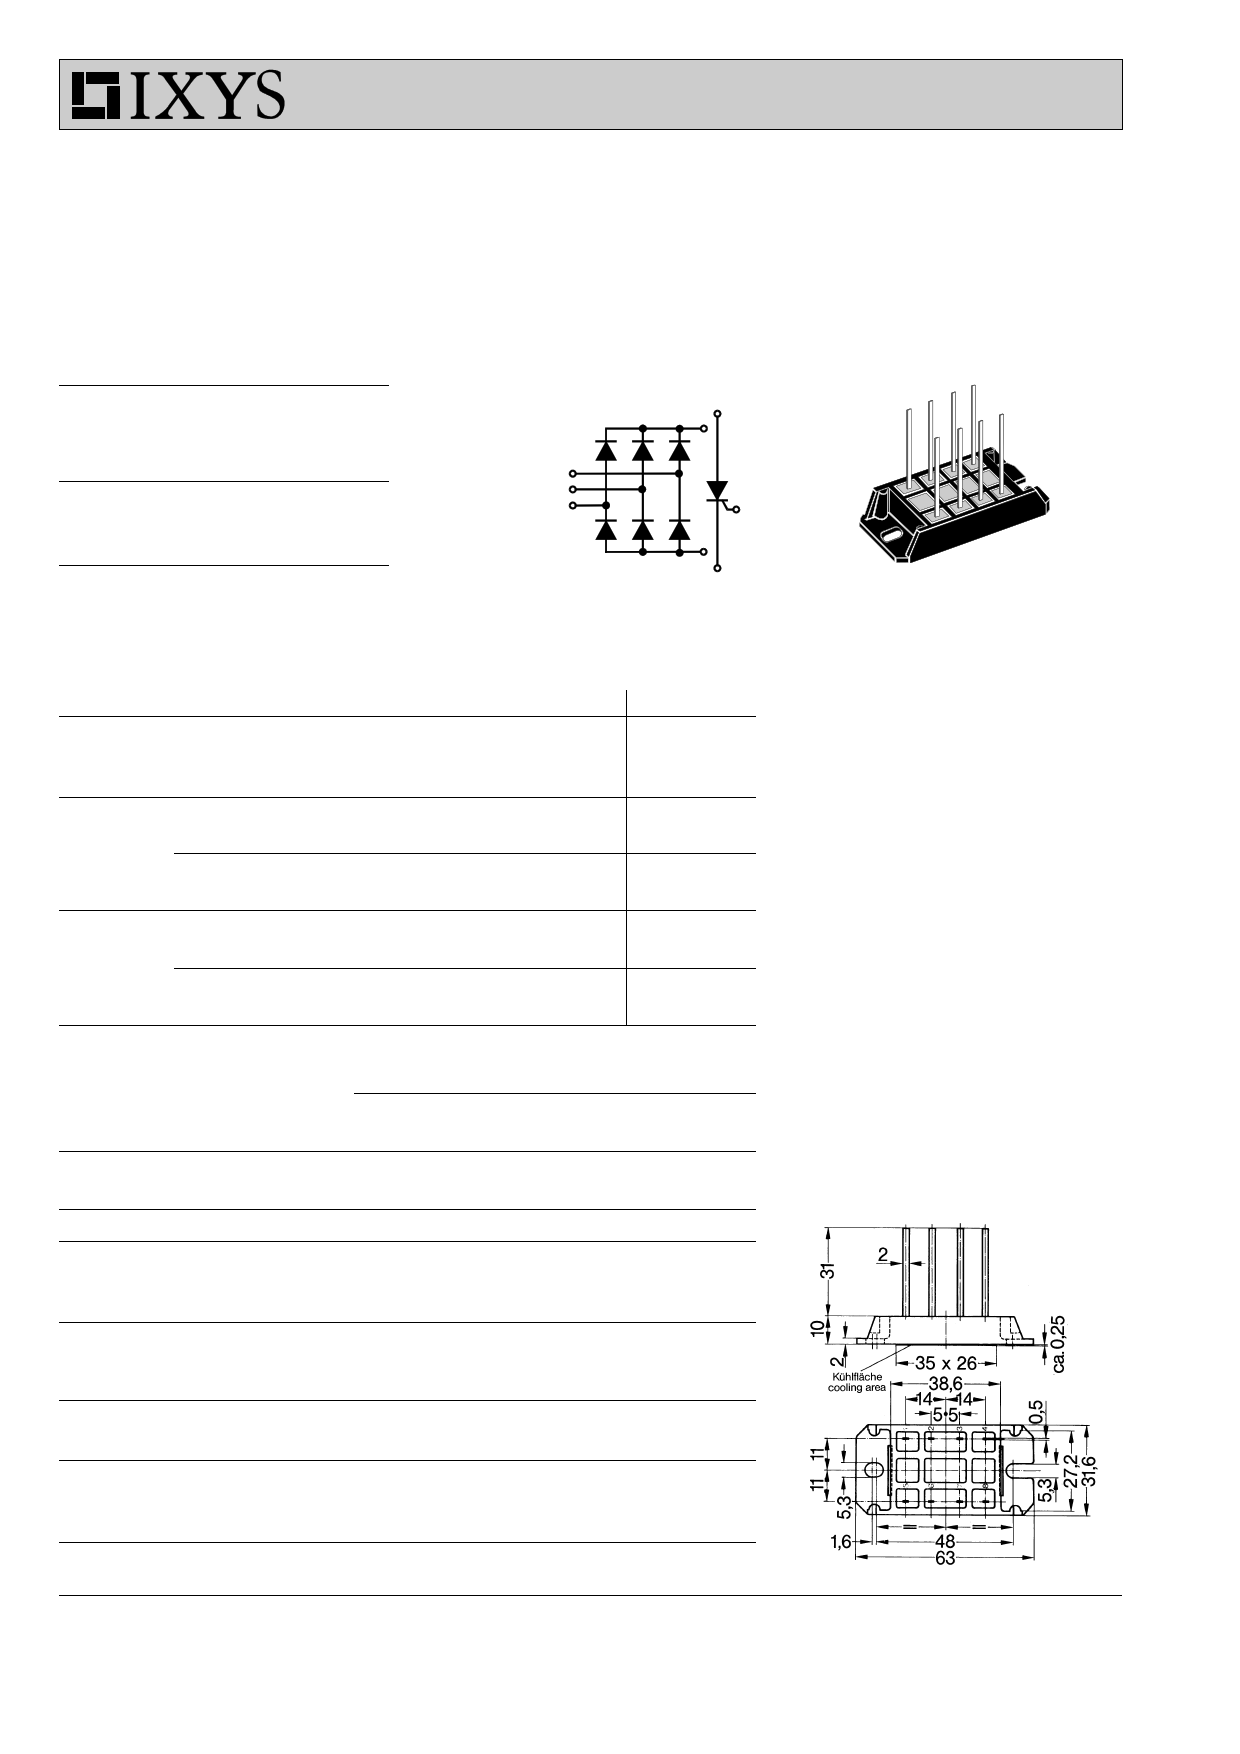 VUC36-14go2 datasheet